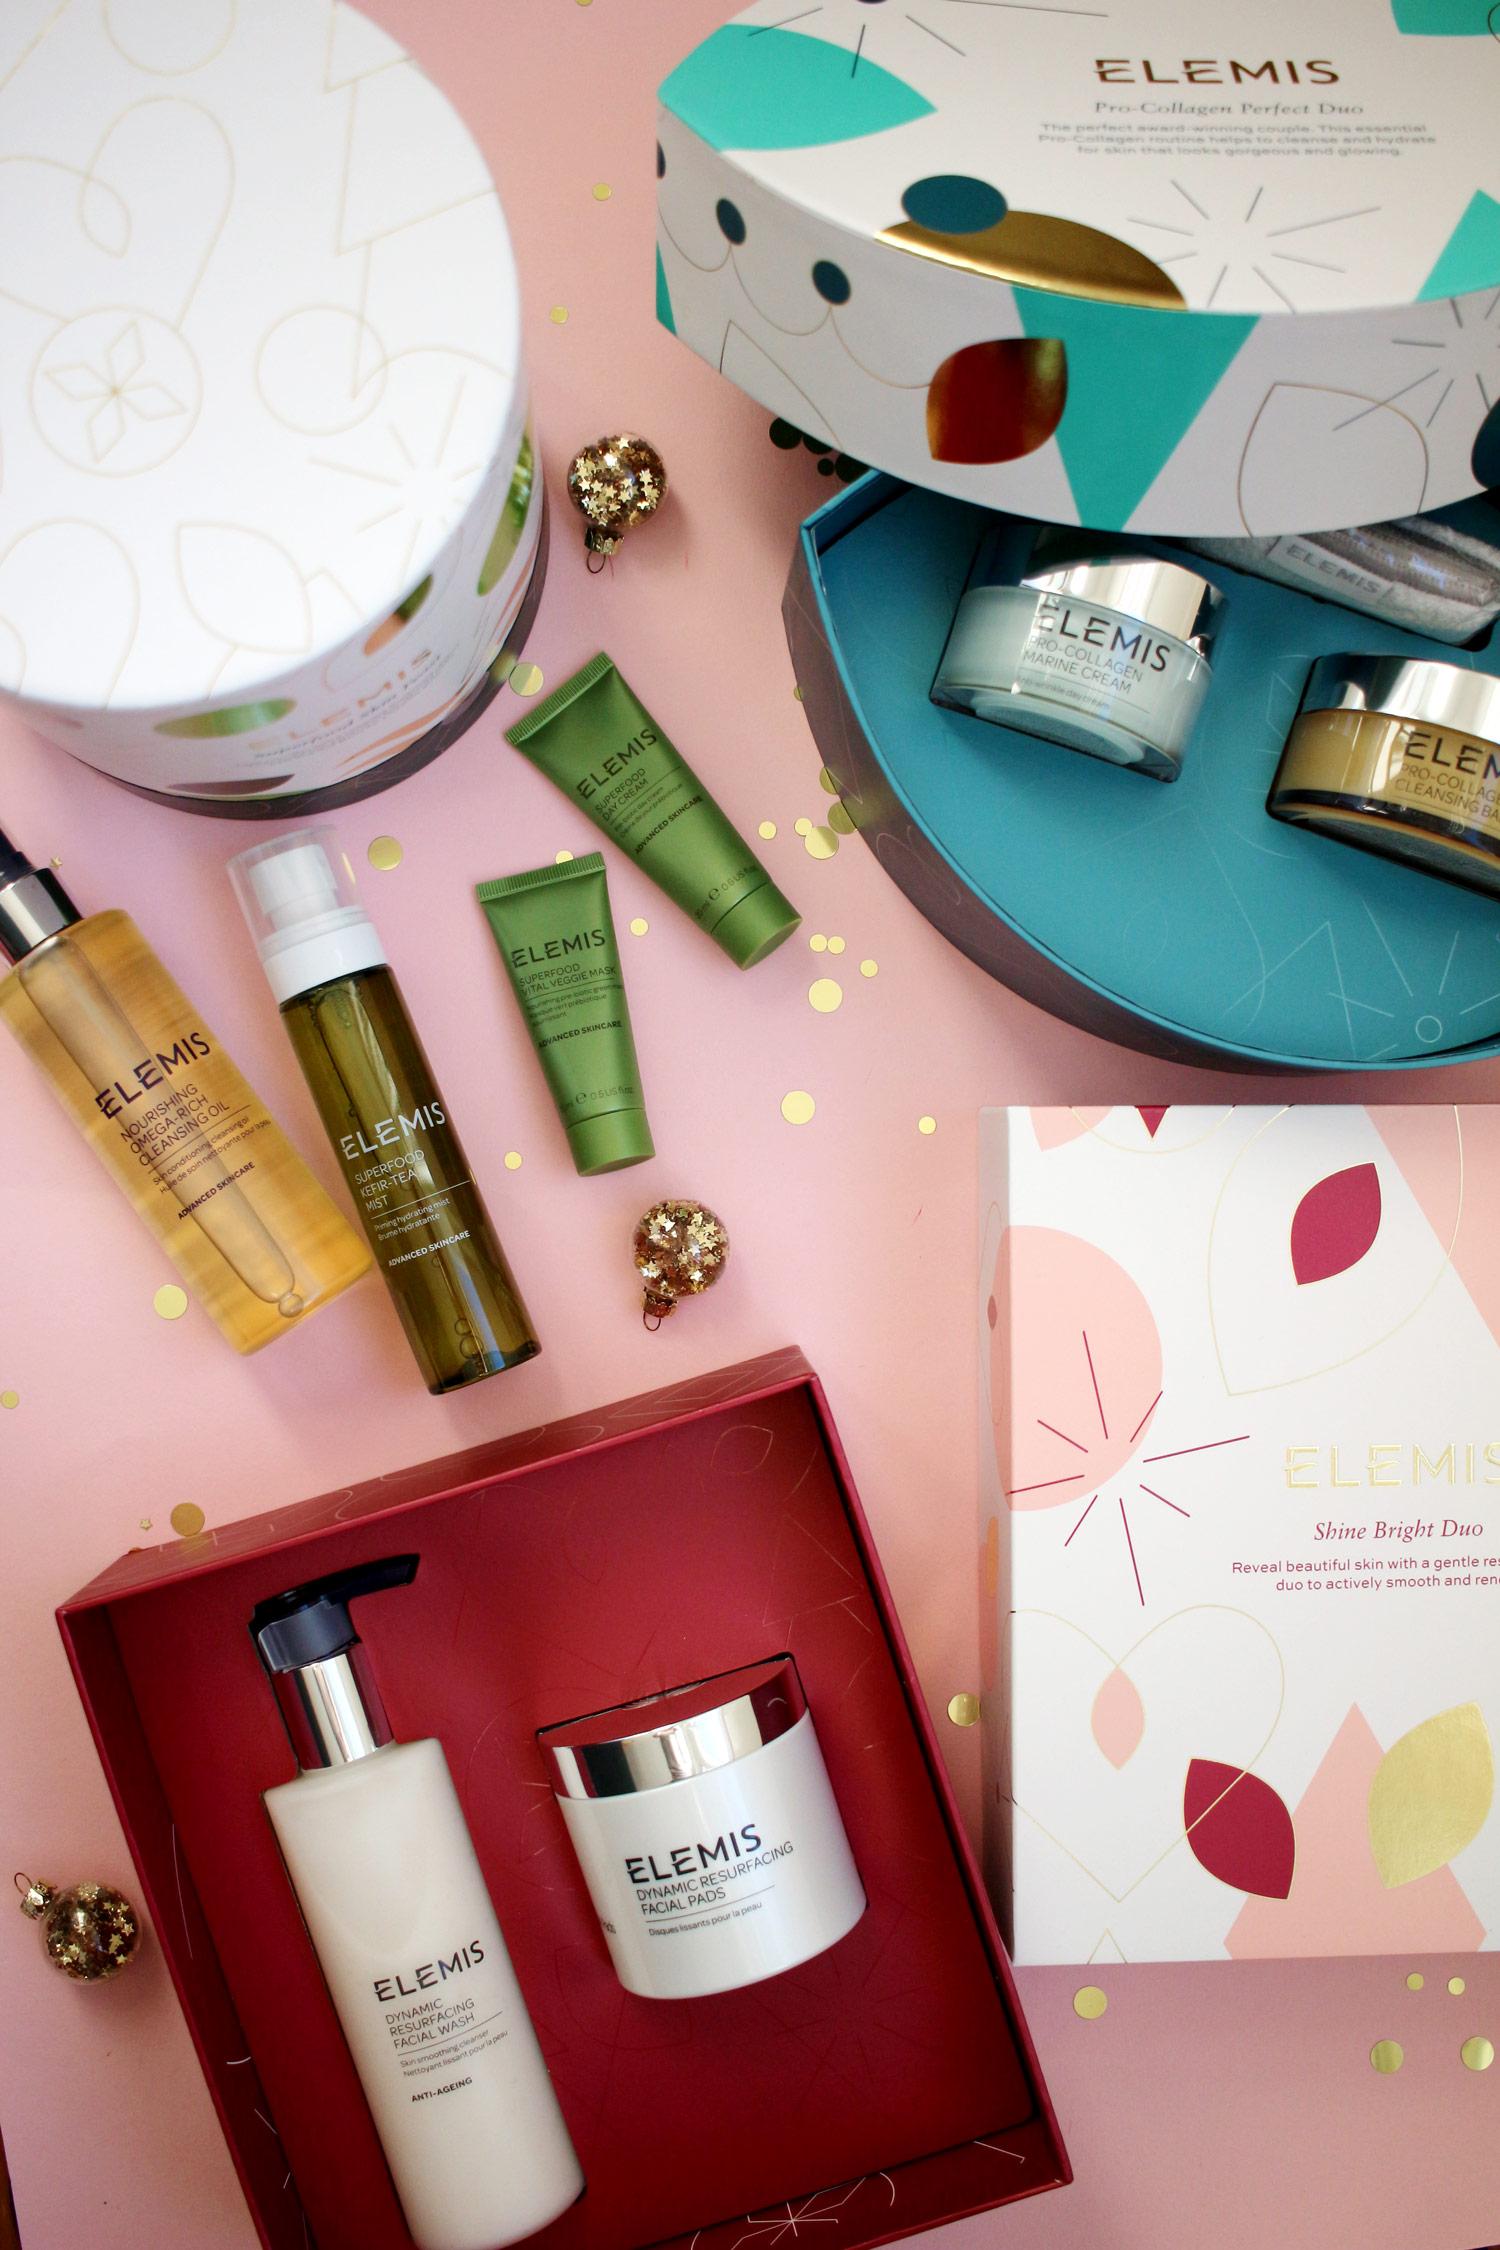 christmas-beauty-gift-guide-drunk-elephant-elemis-2019-2